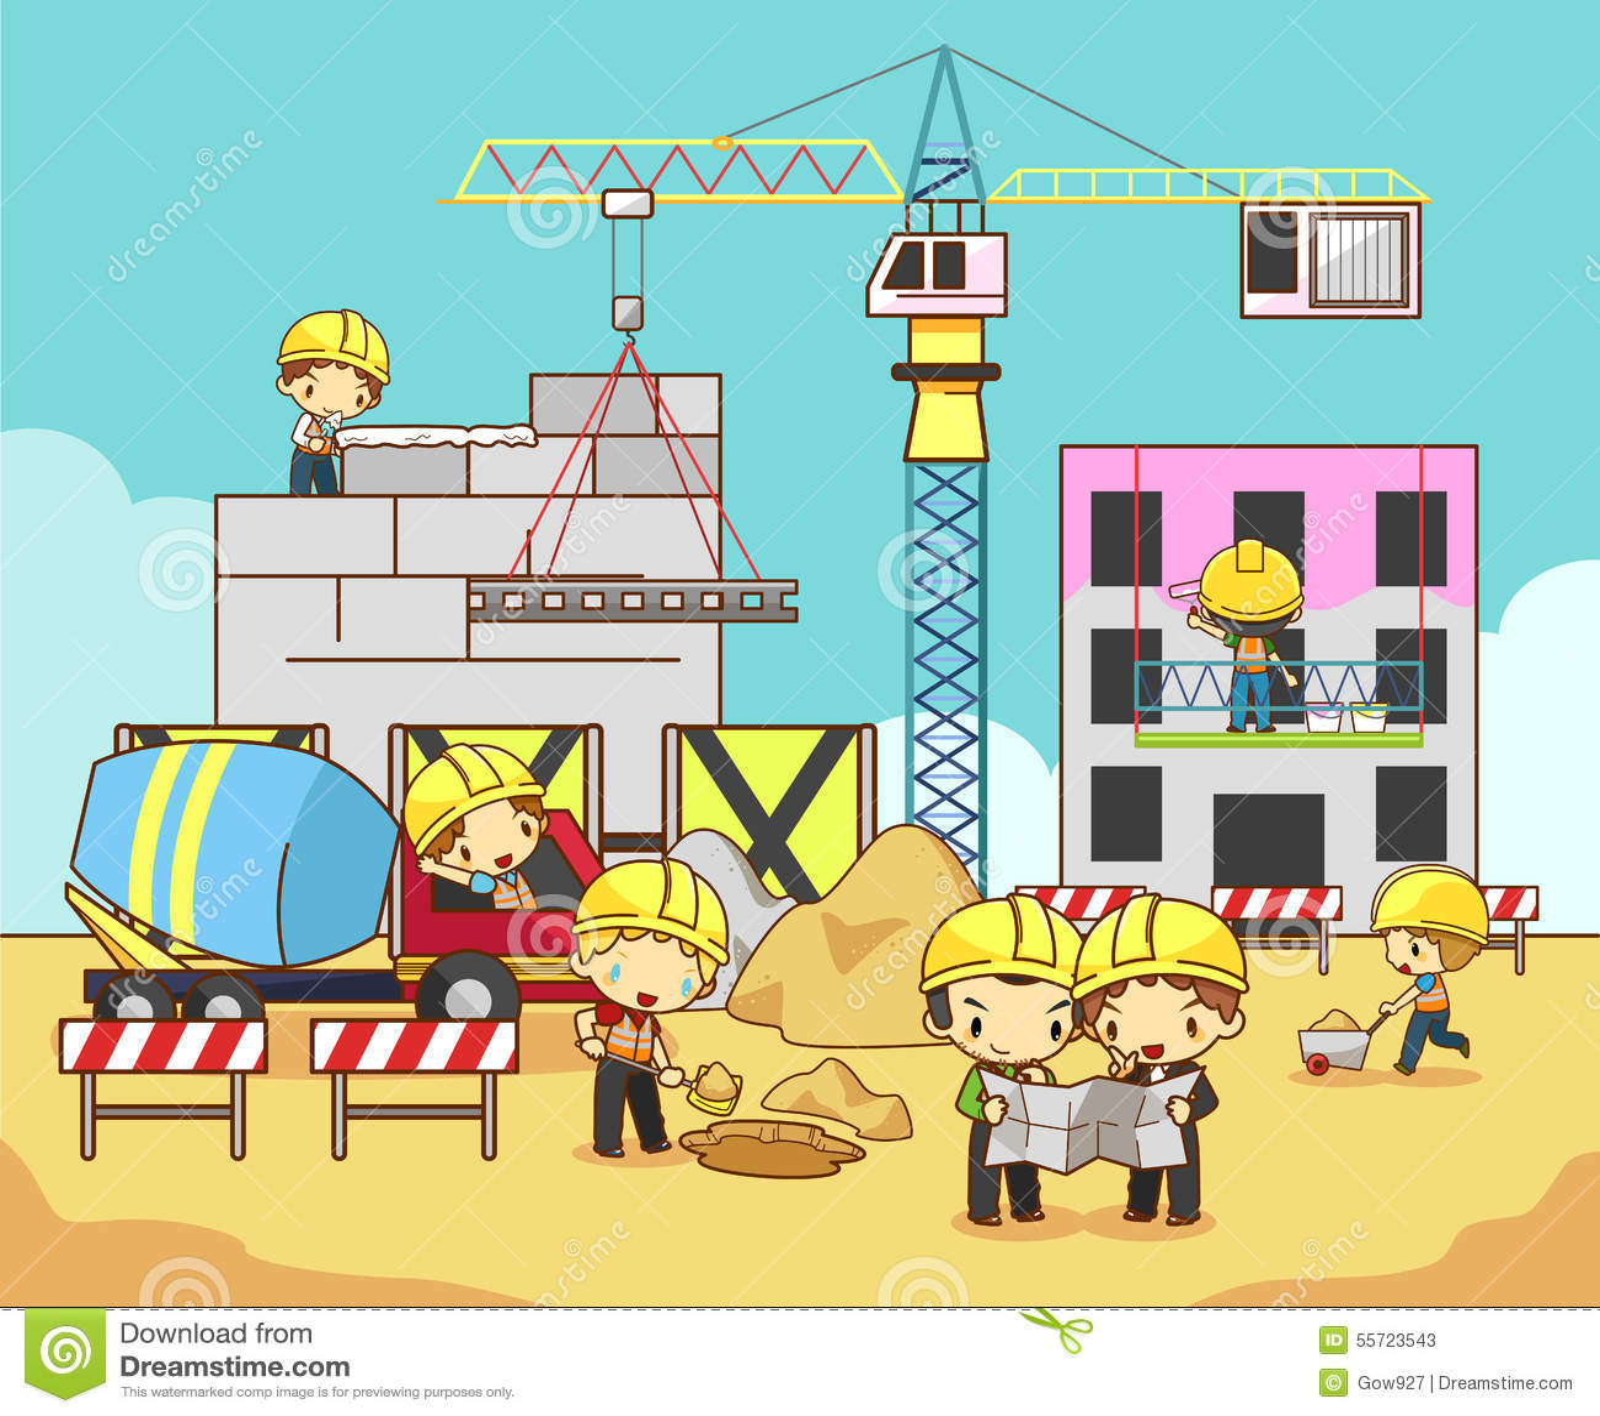 Building Construction Cartoon : Cartoon children engineer technician and labor worker